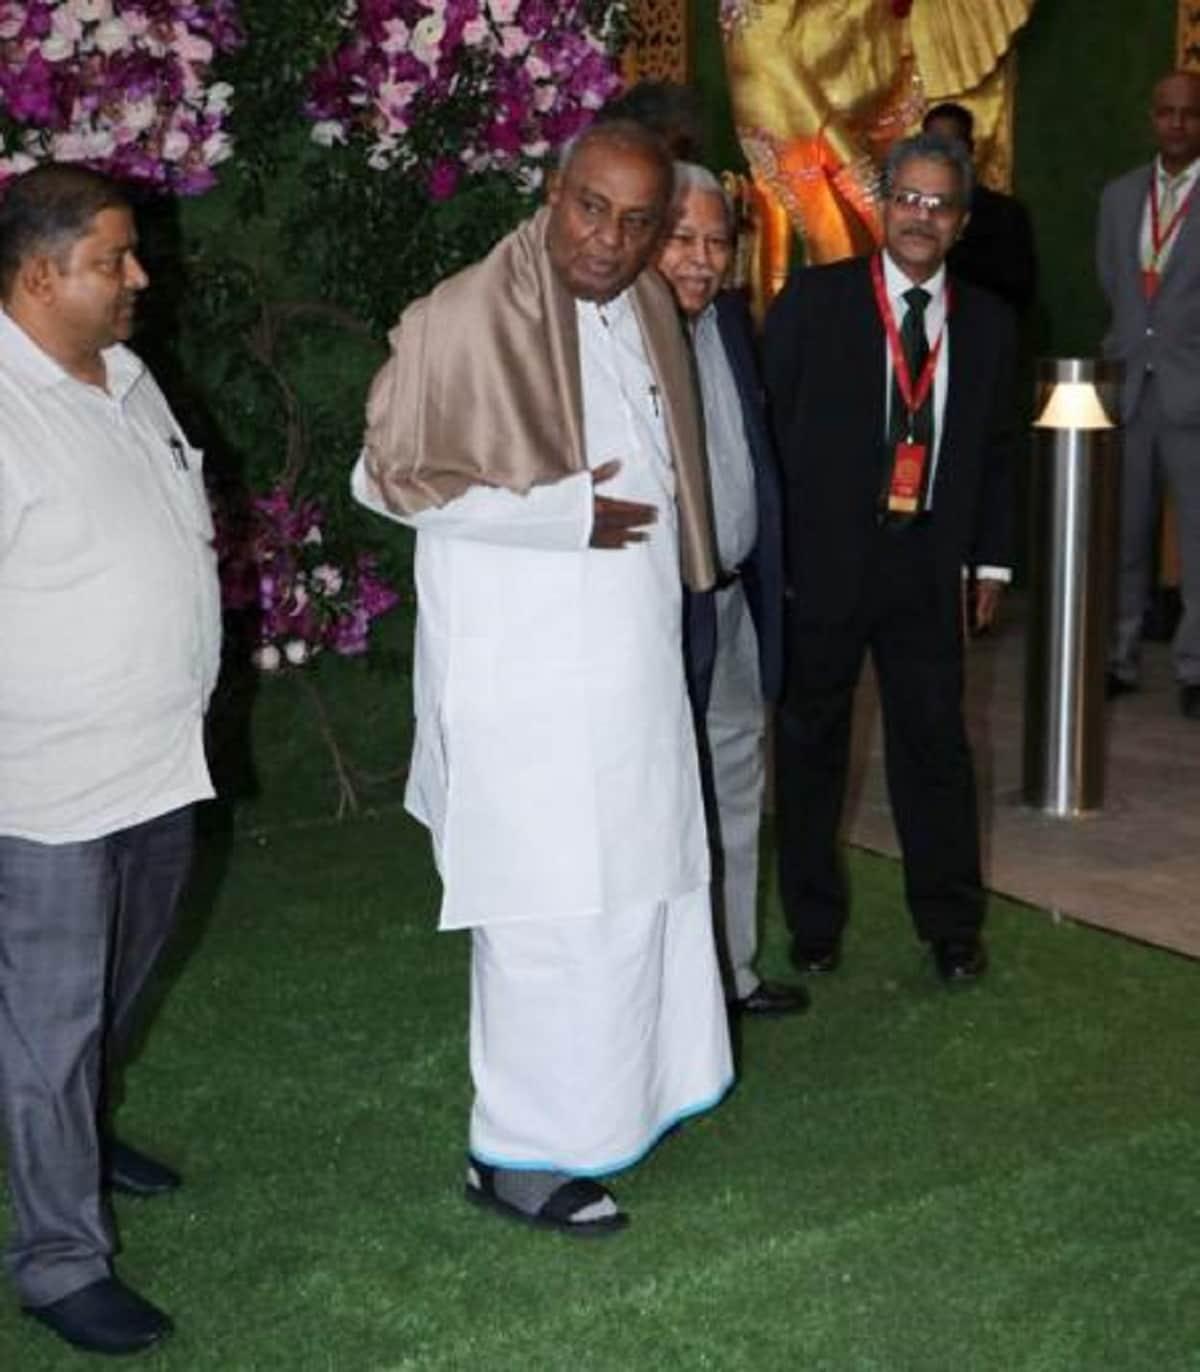 Former prime minister HD Deve Gowda attends Akash Ambani and Shloka Mehta's wedding. (Image: Viral Bhayani)